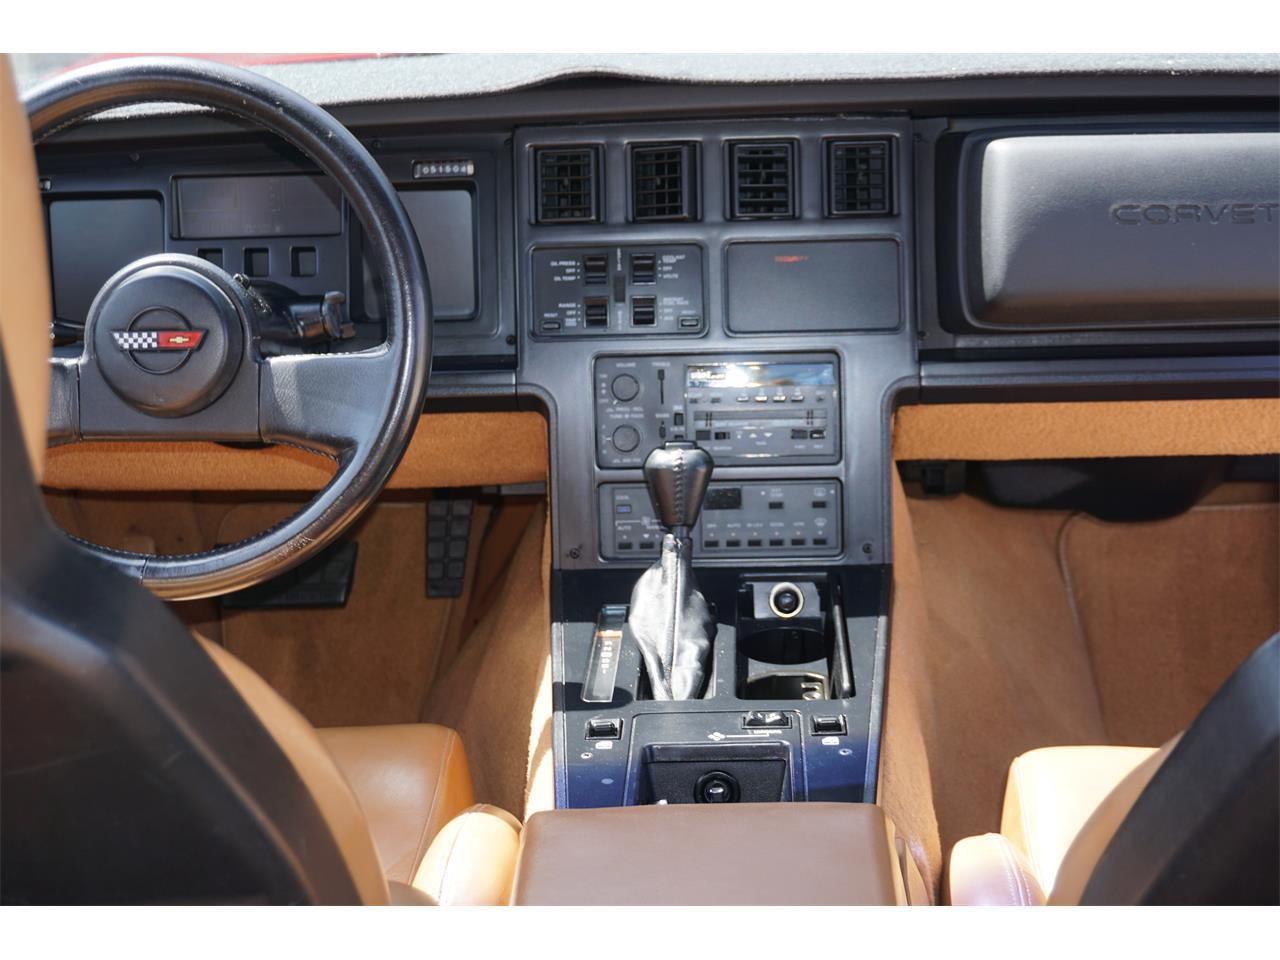 1989 Chevrolet Corvette C4 (CC-1251726) for sale in Grand Junction, Colorado